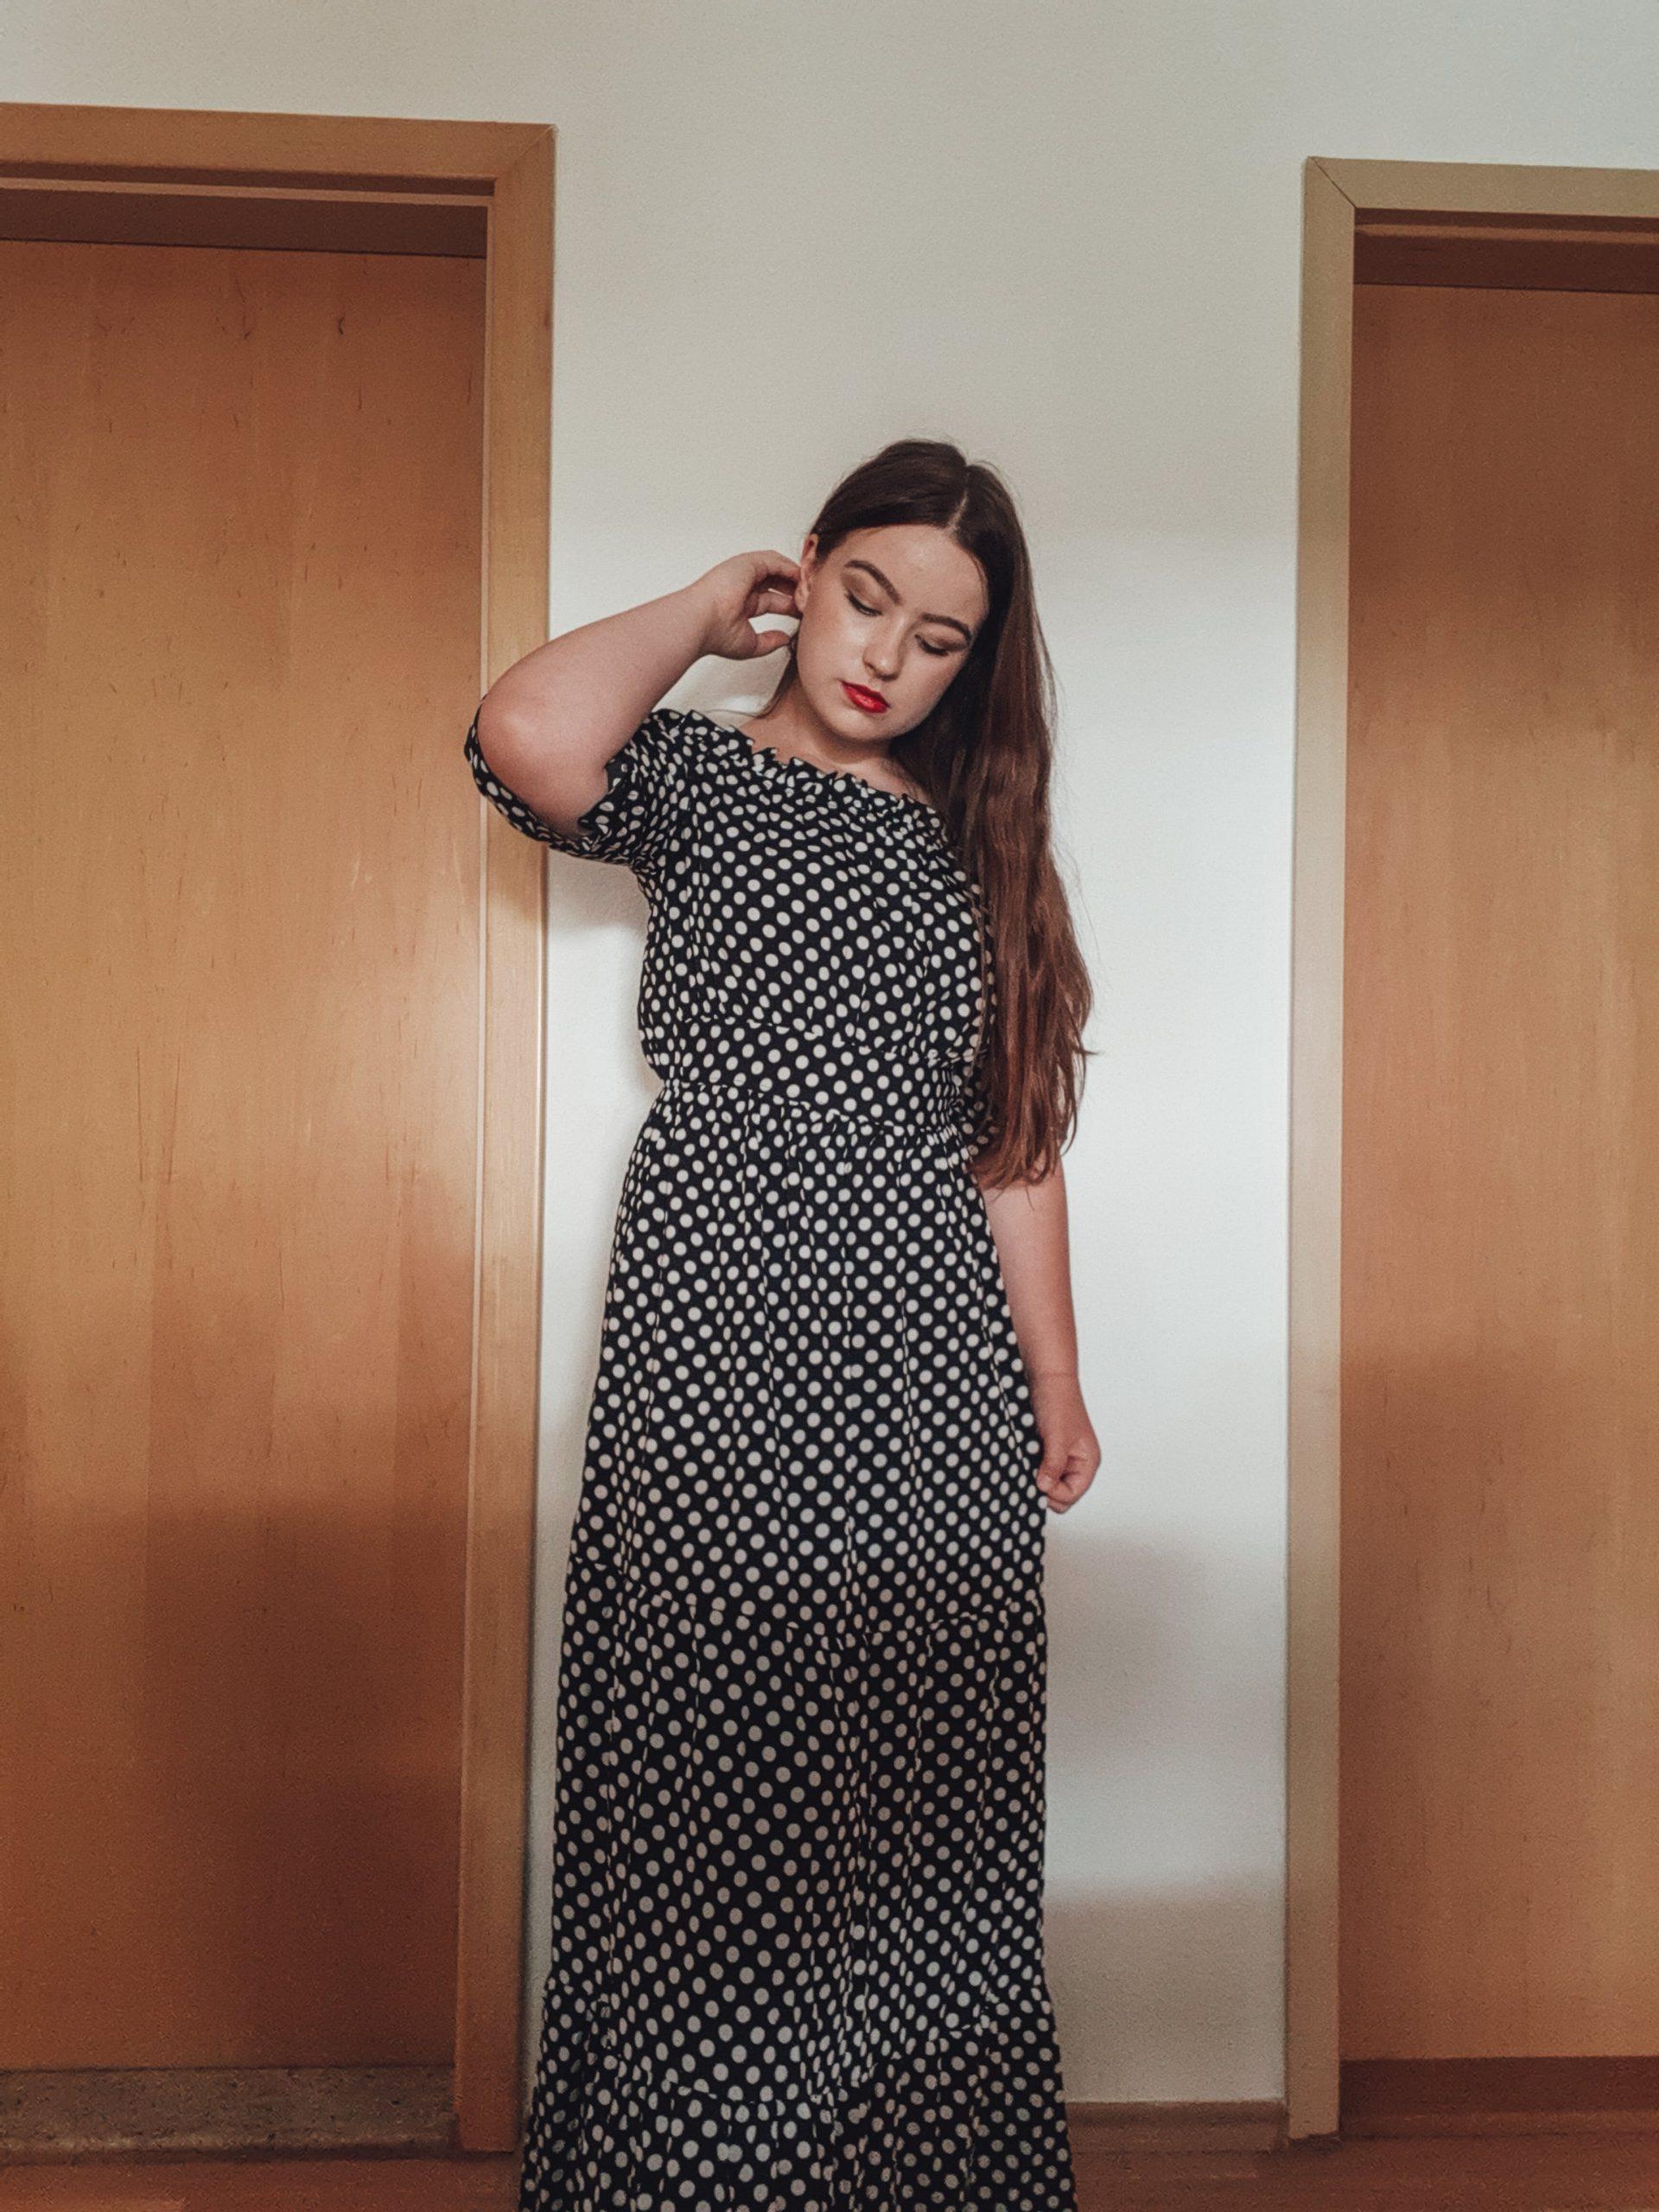 polka dot dress outfit livinglikev fashion blogger style blogger living like v vildana šuta vildana livinglikev style fashion blog